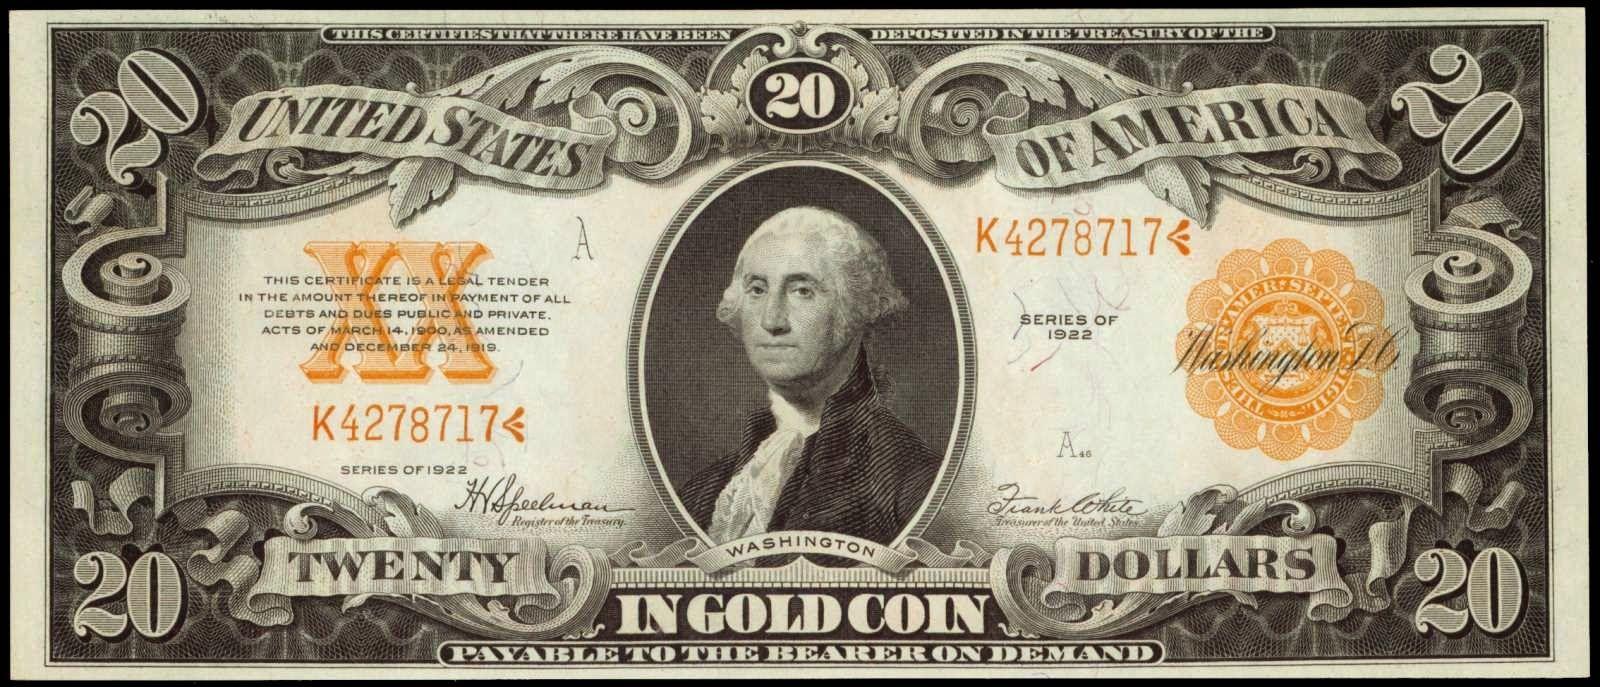 Paper Money of the United States: Twenty Dollar Gold Certificate, Series of 1922, George Washington